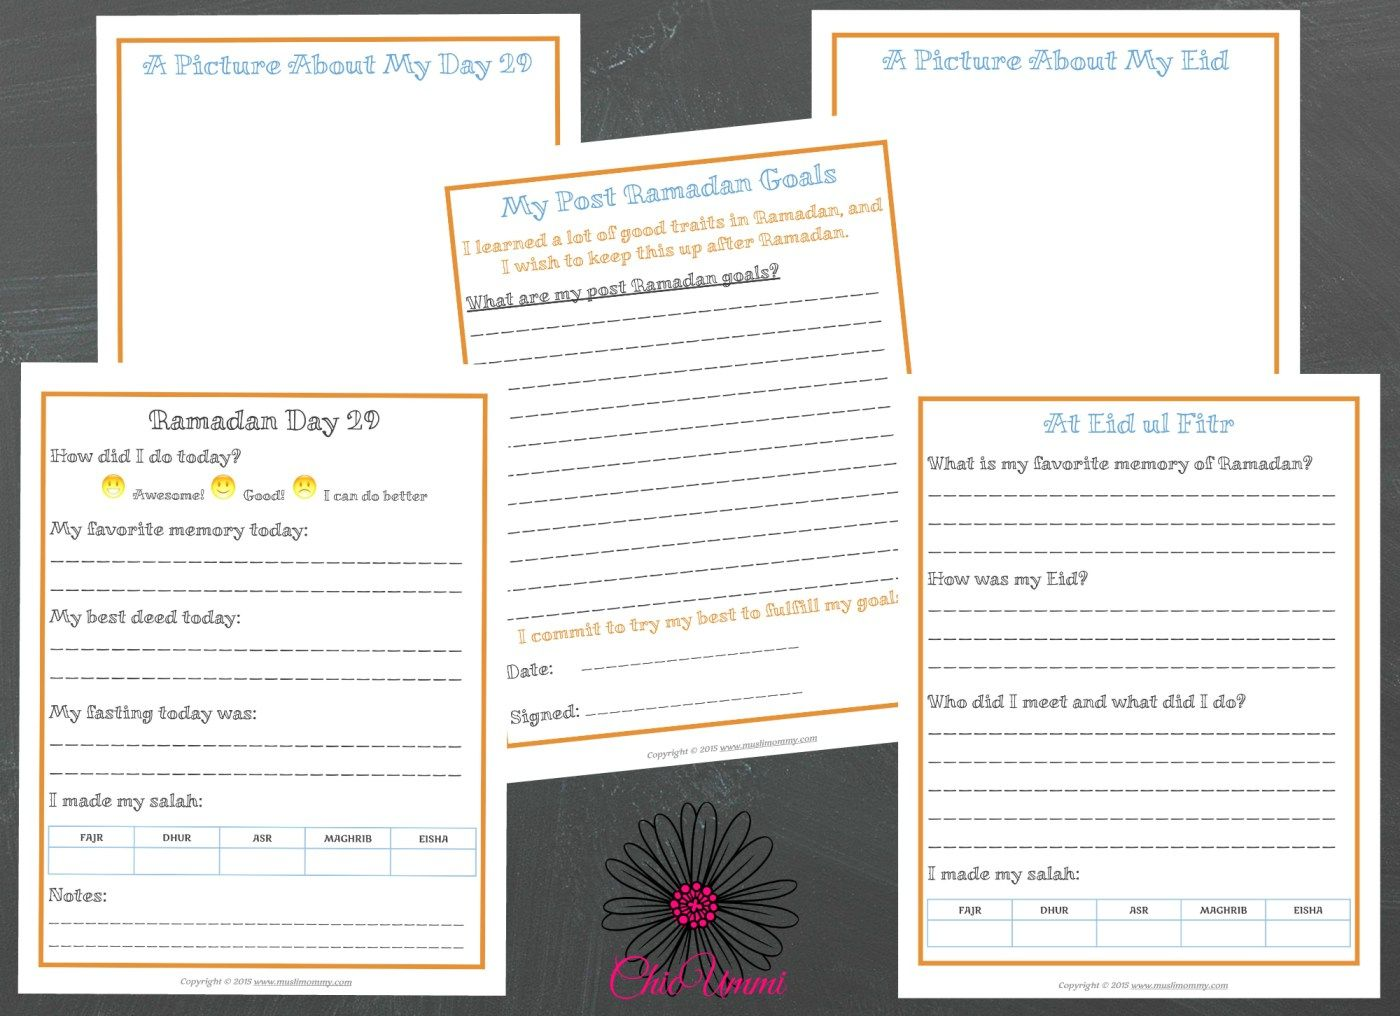 photo journal sample